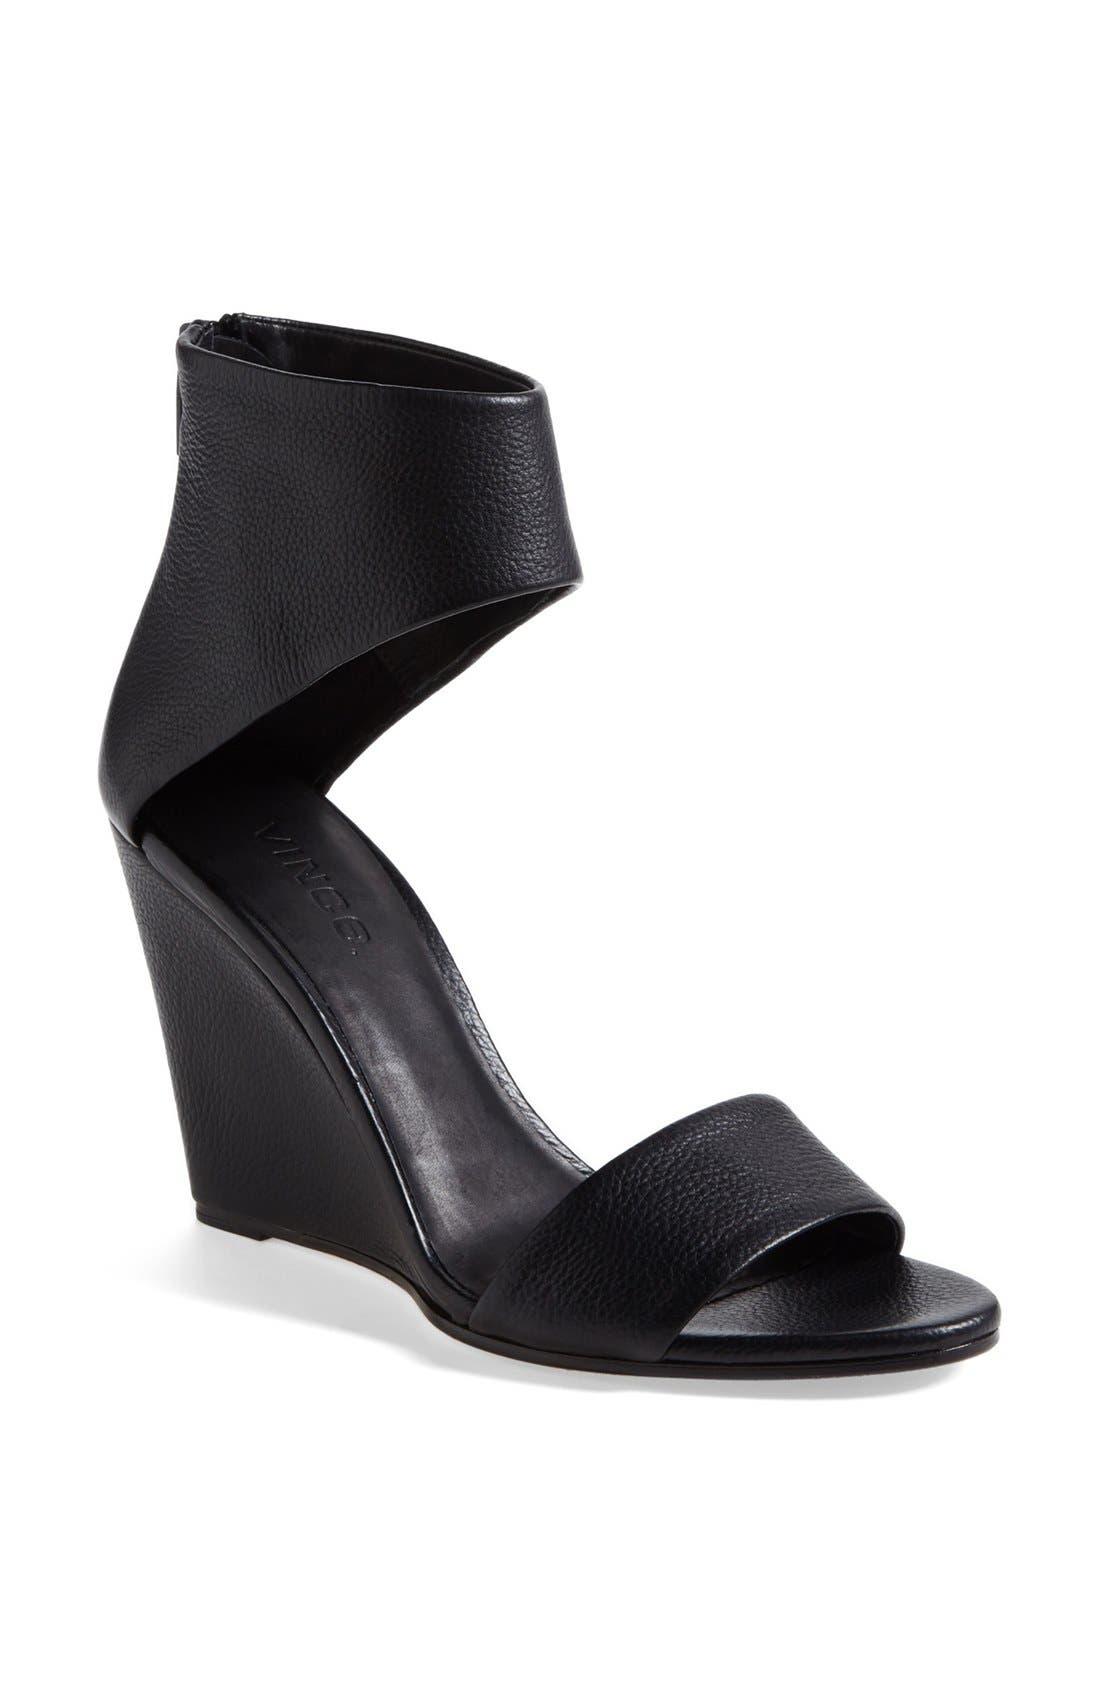 Alternate Image 1 Selected - Vince 'Kelan' Ankle Strap Sandal